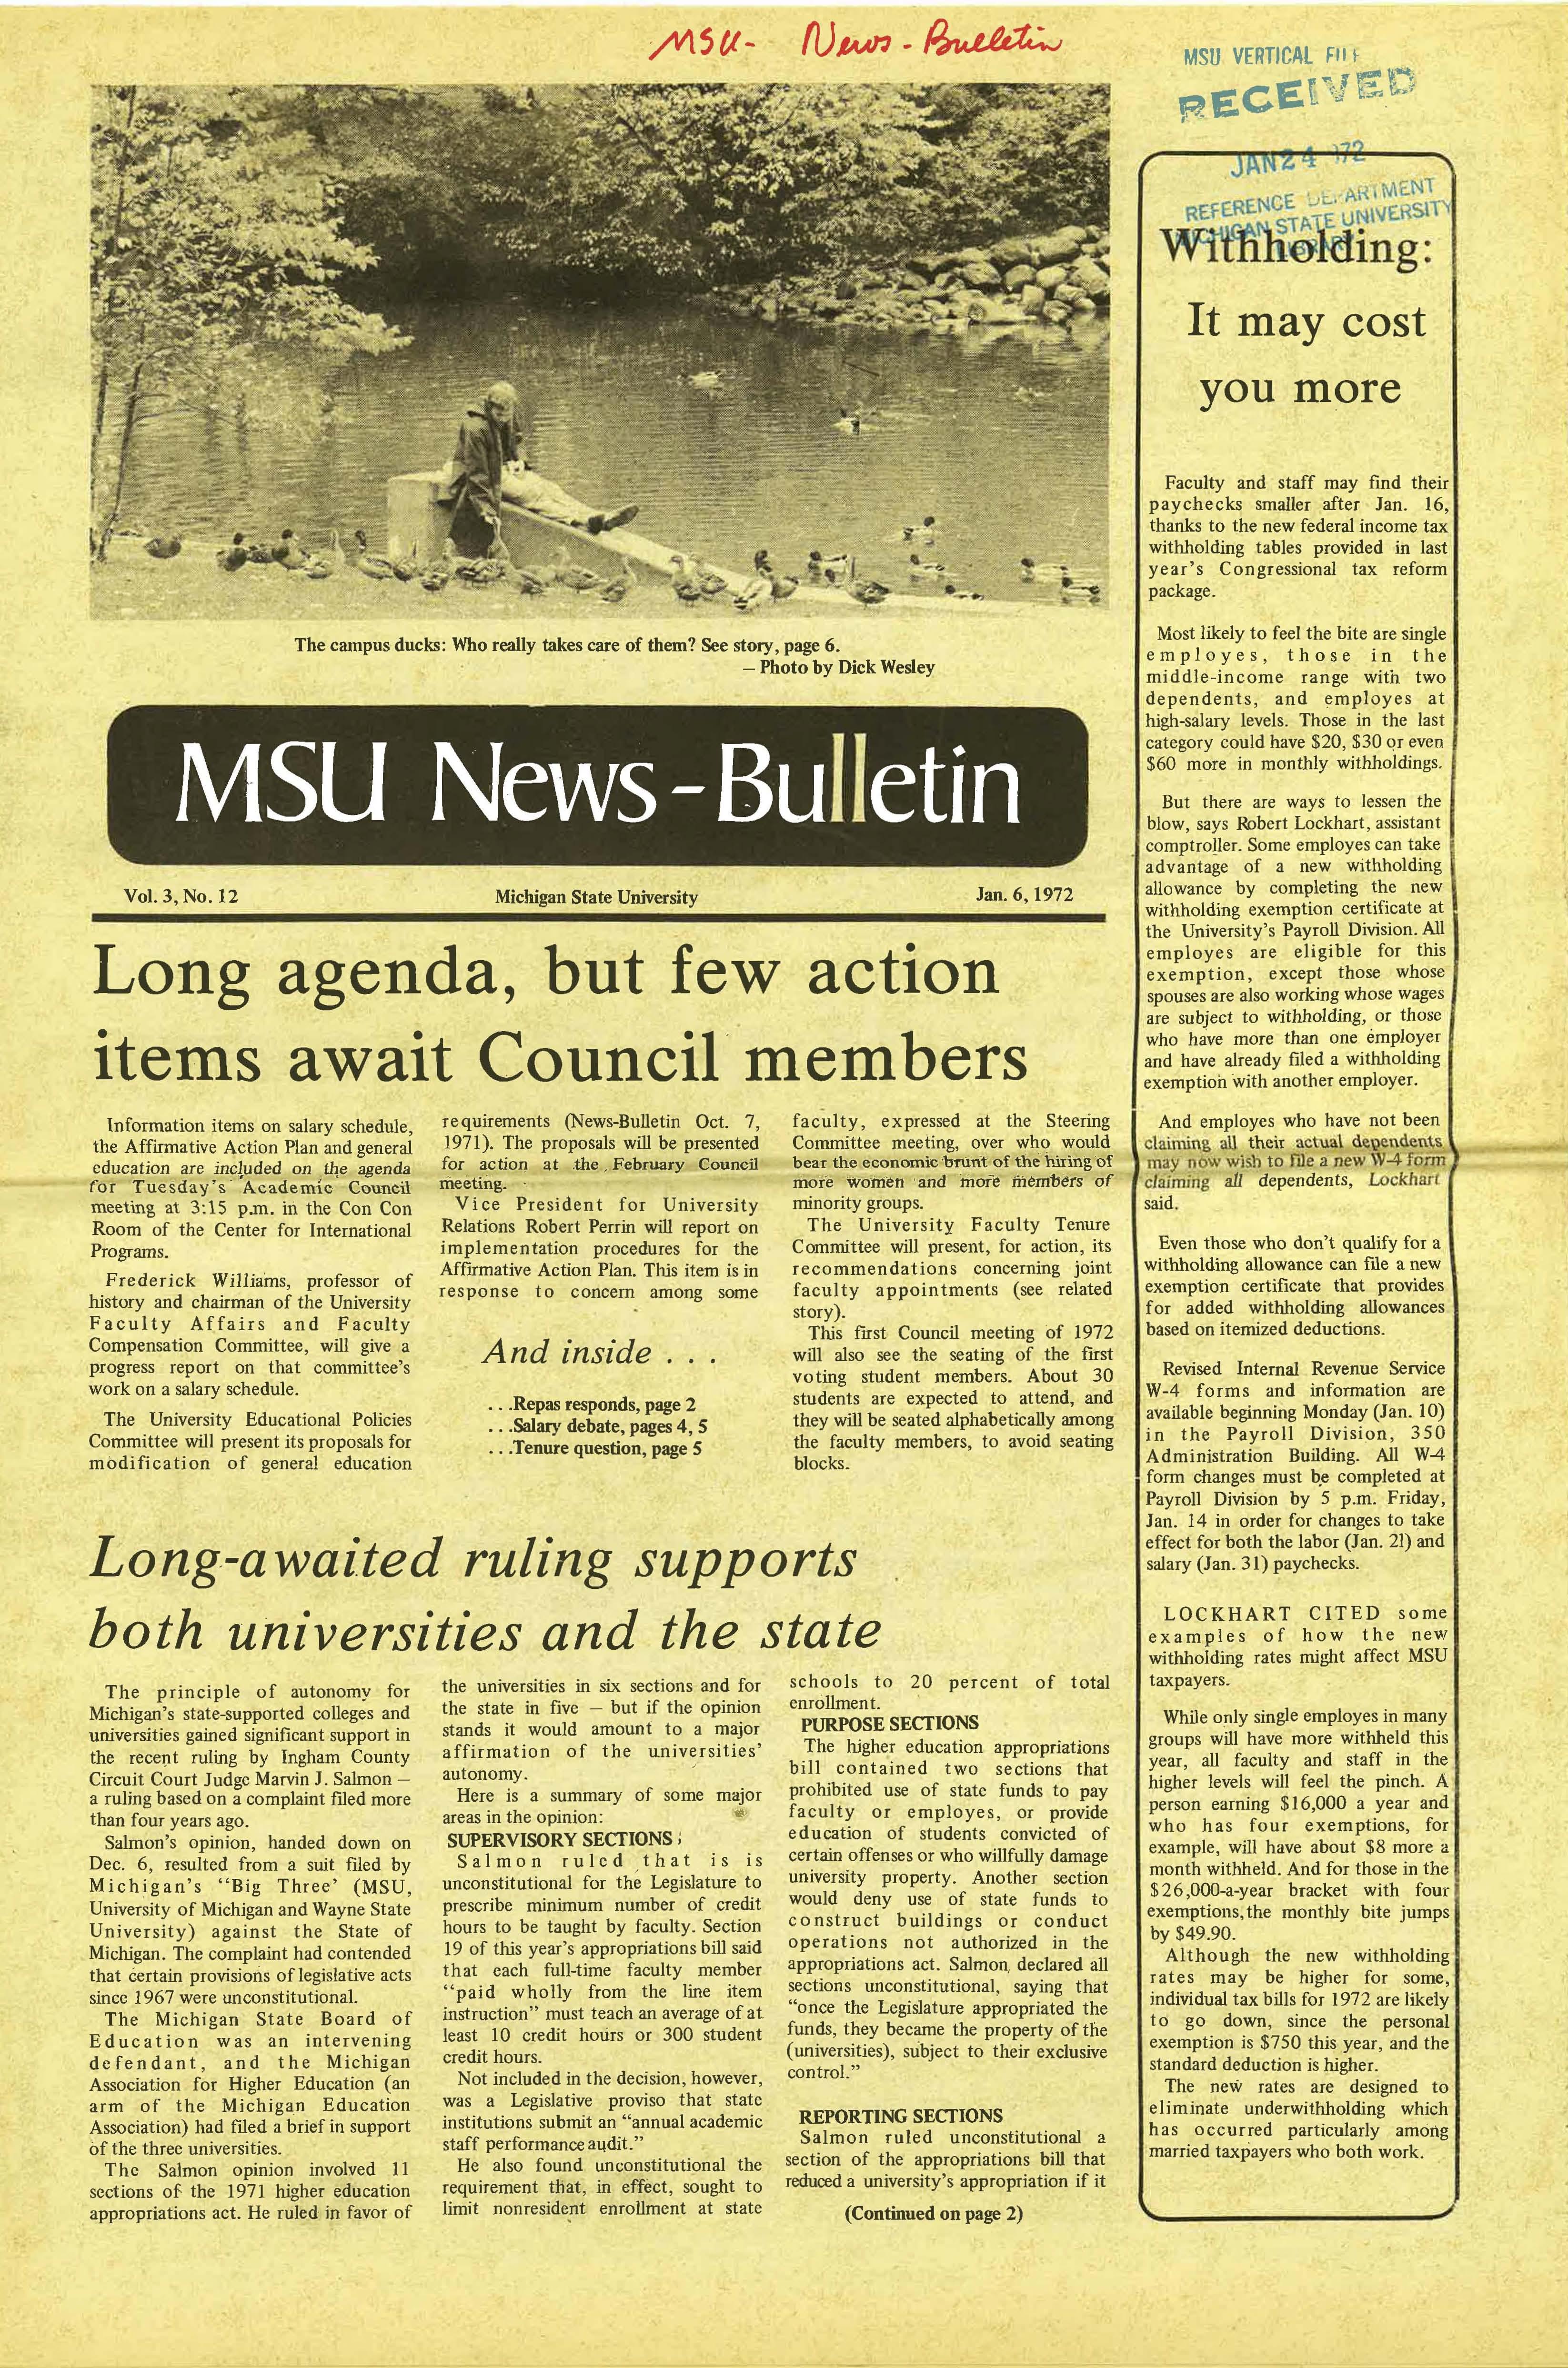 MSU News Bulletin, vol. 3, No. 16, February 3, 1972